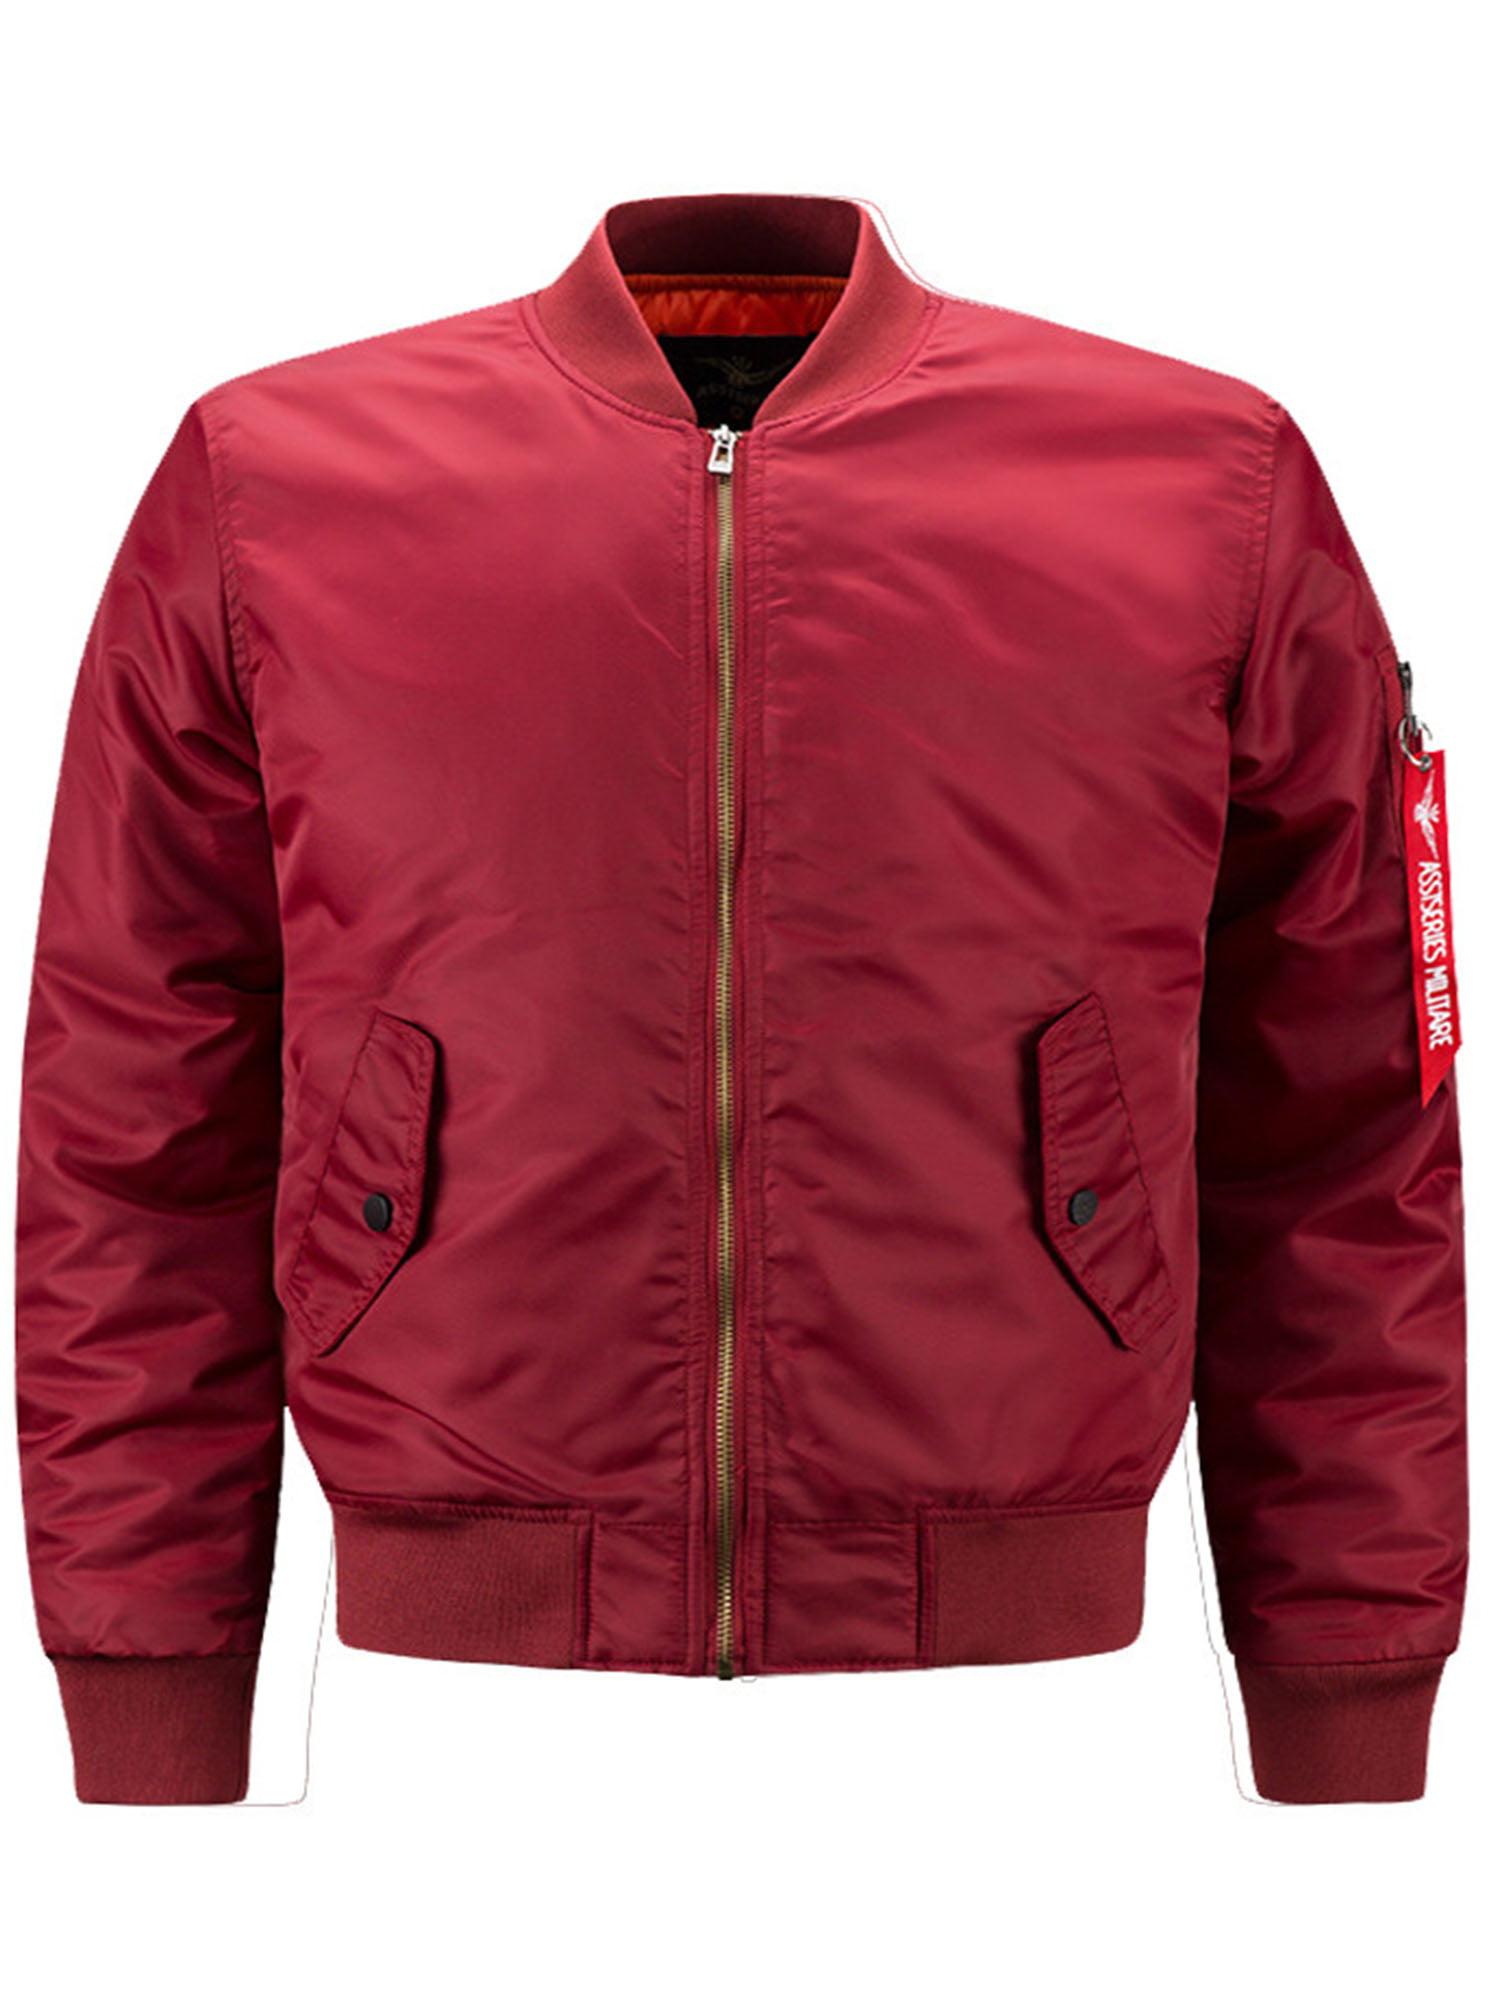 Tops Coat Long Sleeve Baseball Jacket Slim Fit Casual Mens Zipper Black Outwear